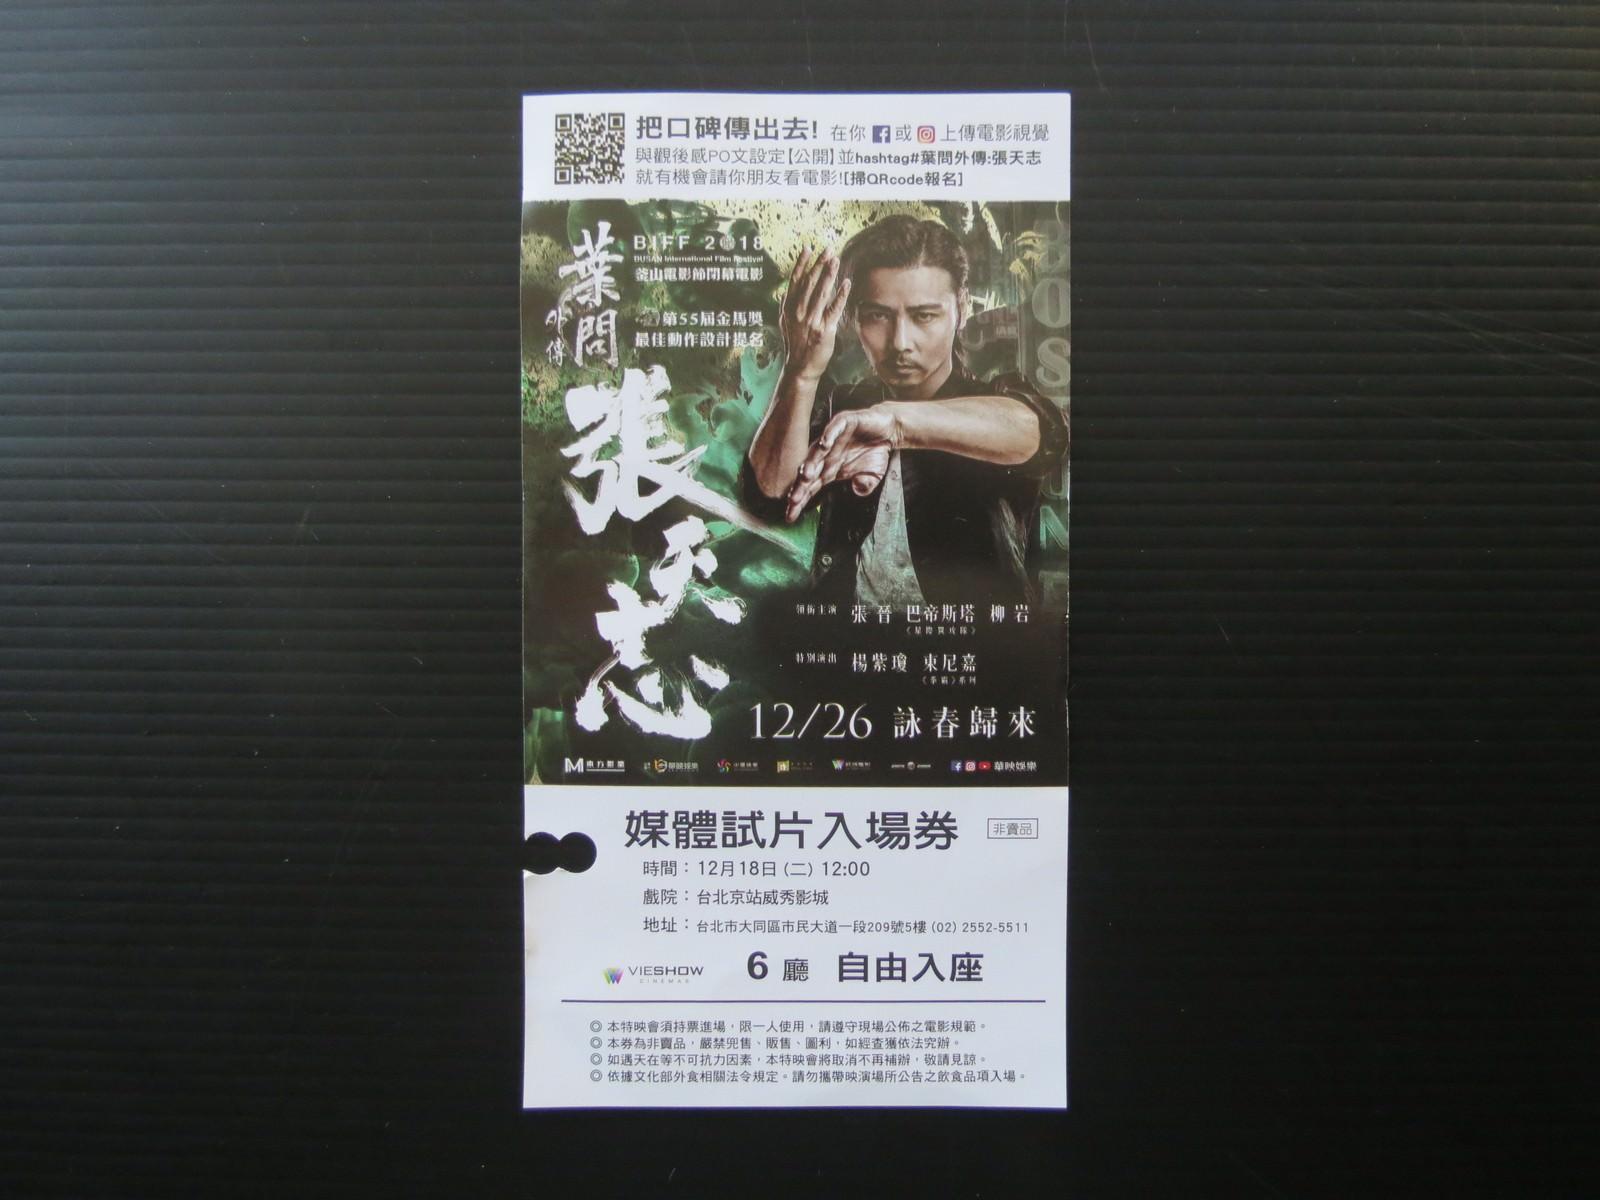 Movie, 葉問外傳:張天志(香港, 2018年) / 葉問外傳:張天志(台灣) / 叶问外传:张天志(中國) / Master Z: Ip Man Legacy(英文), 特映會電影票